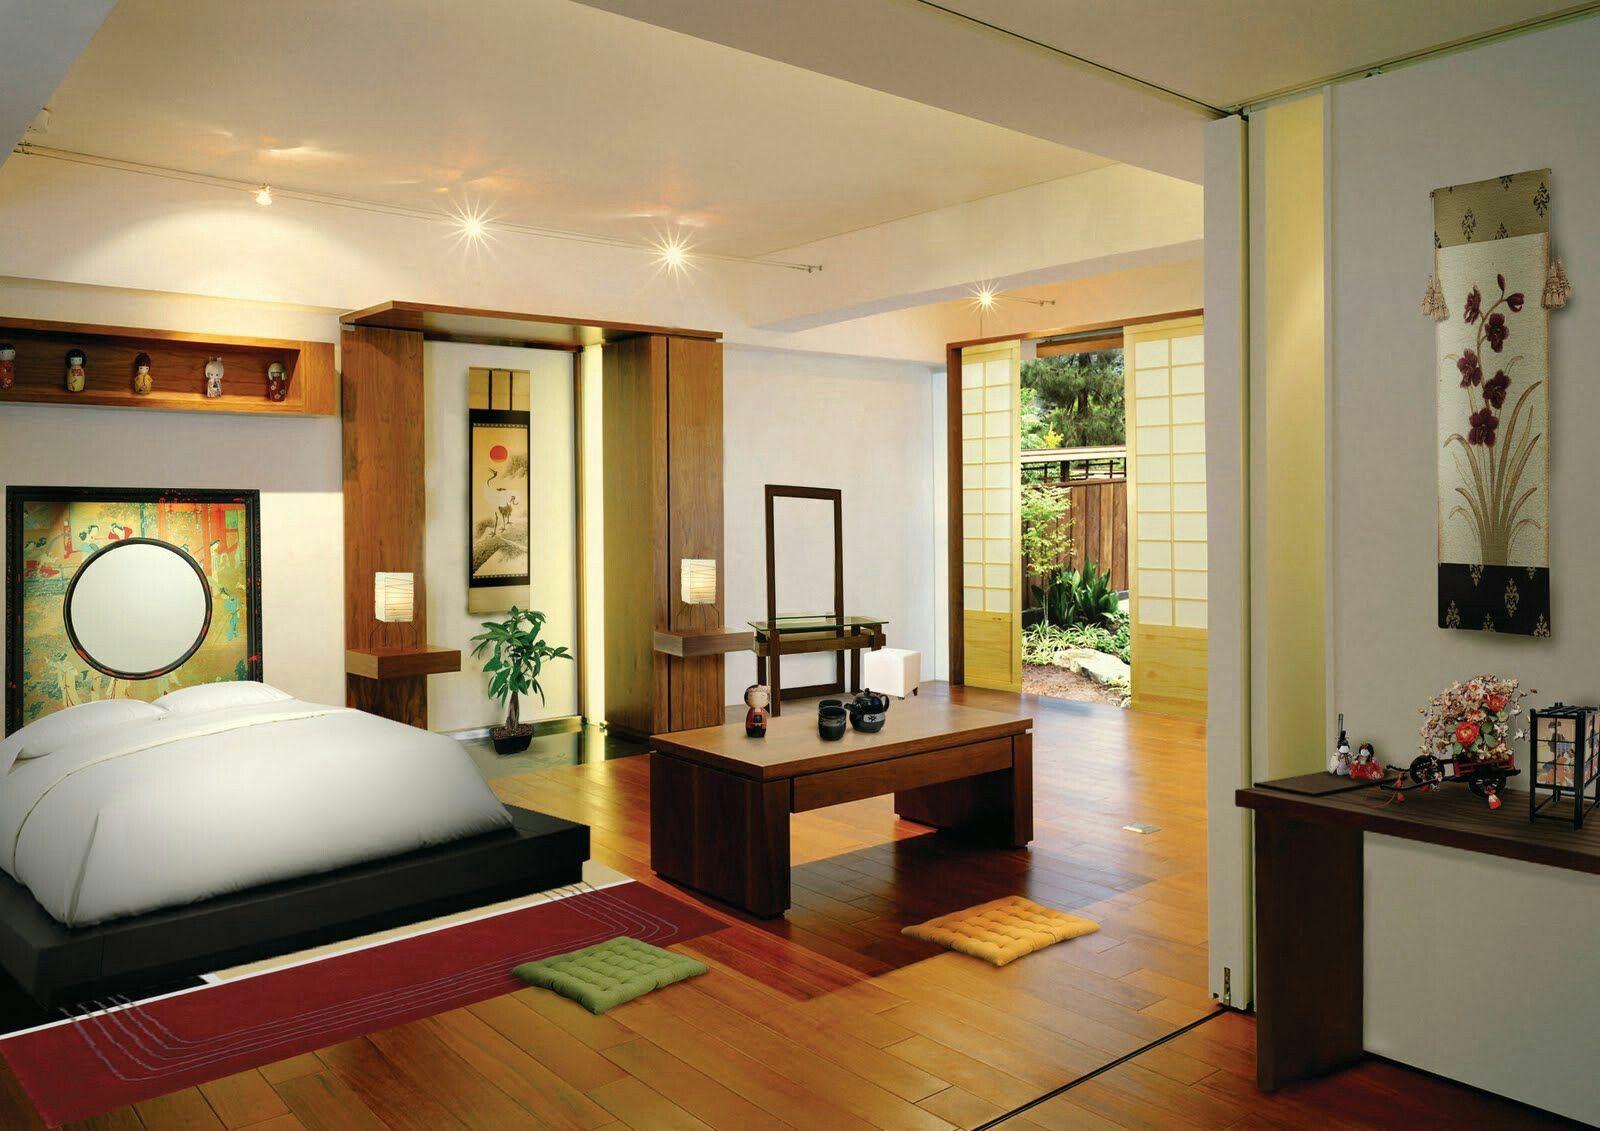 Pin by april anderson on zen bedroom ideas pinterest bedrooms